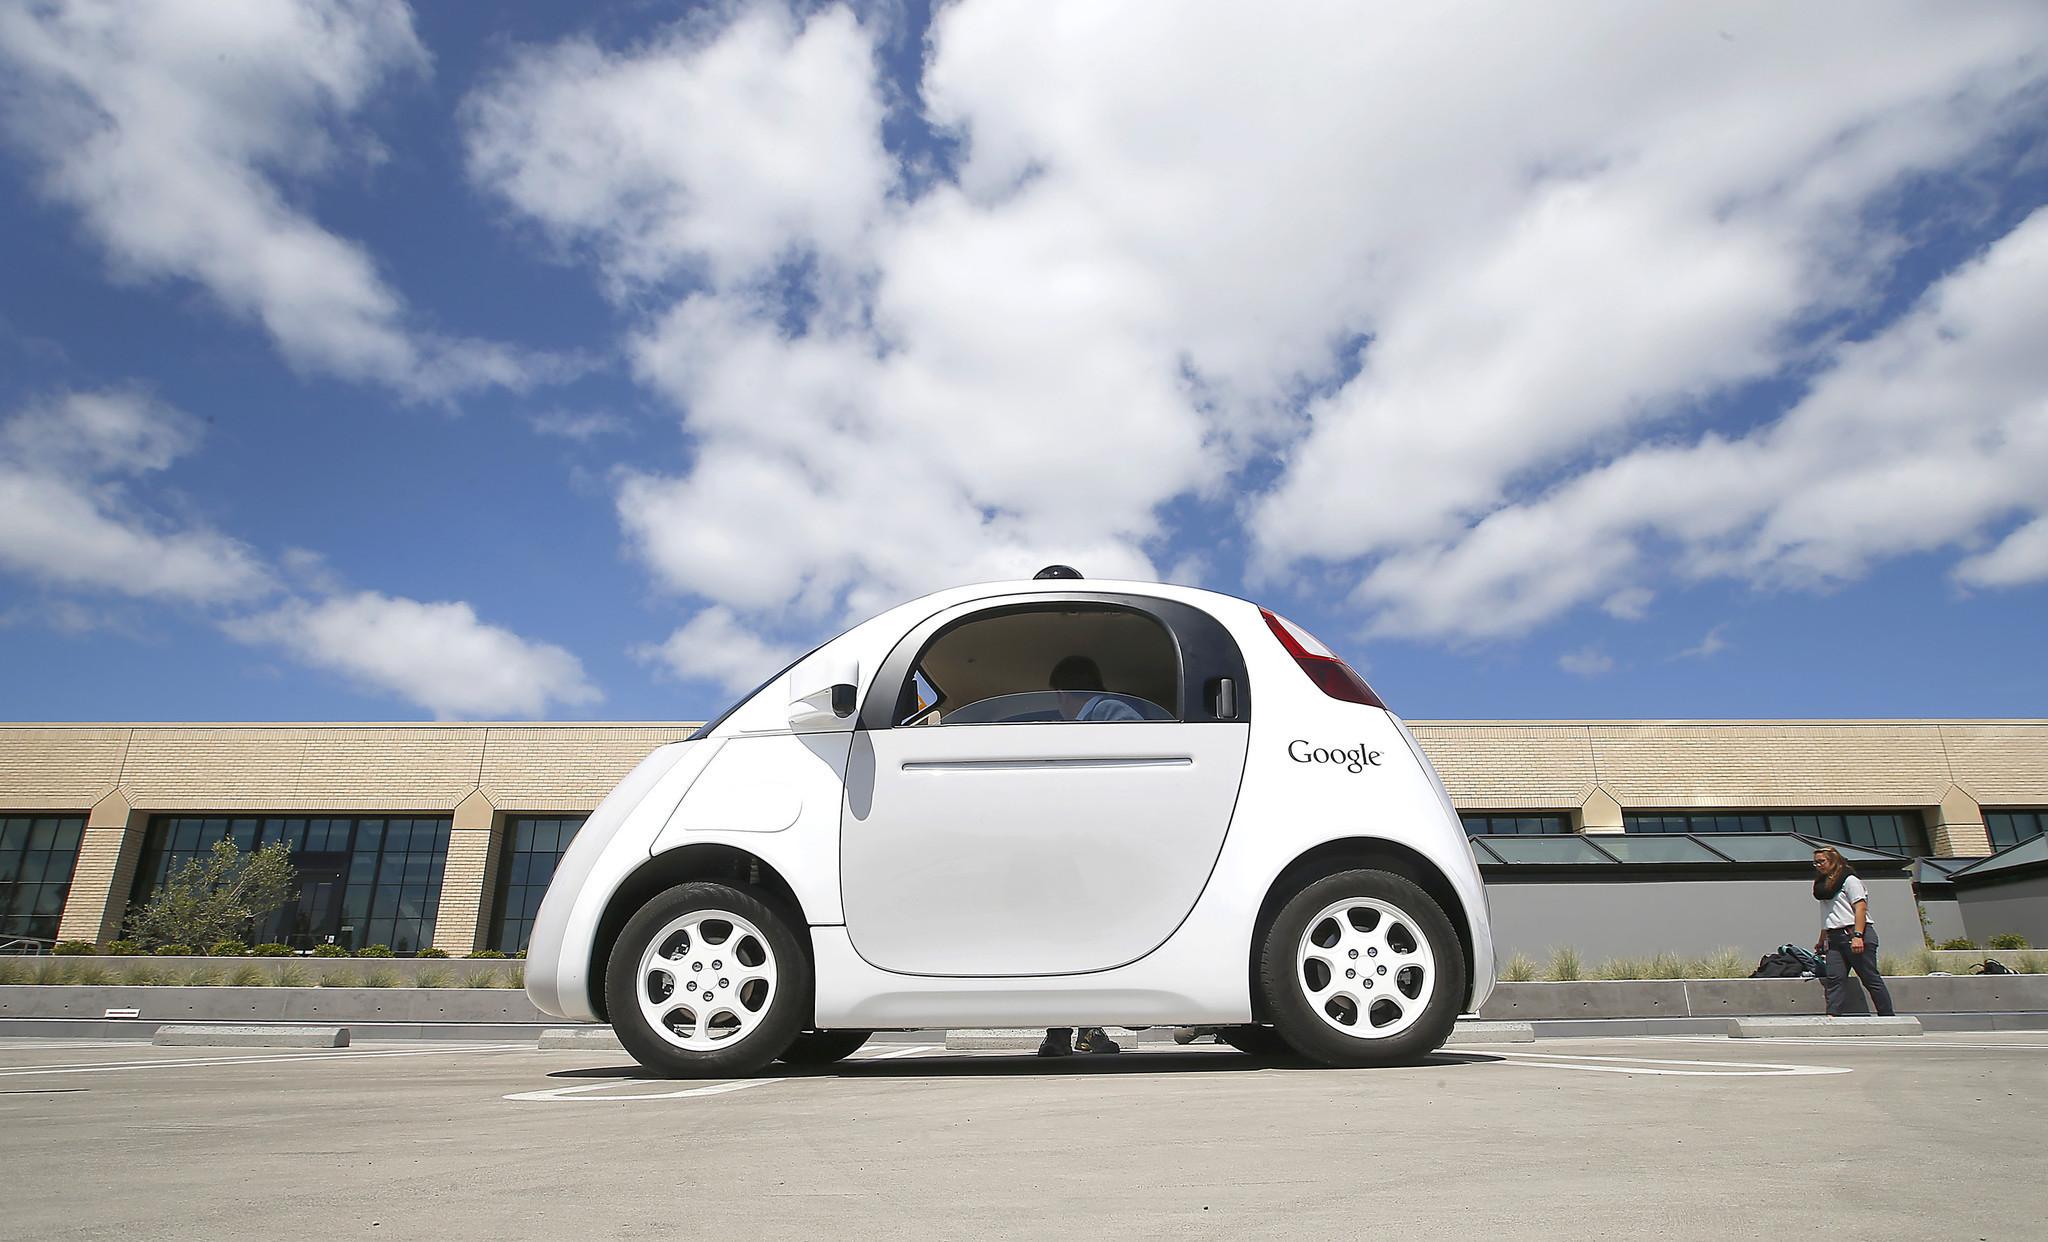 Google Car senza GPS grazie a nuova tecnologia